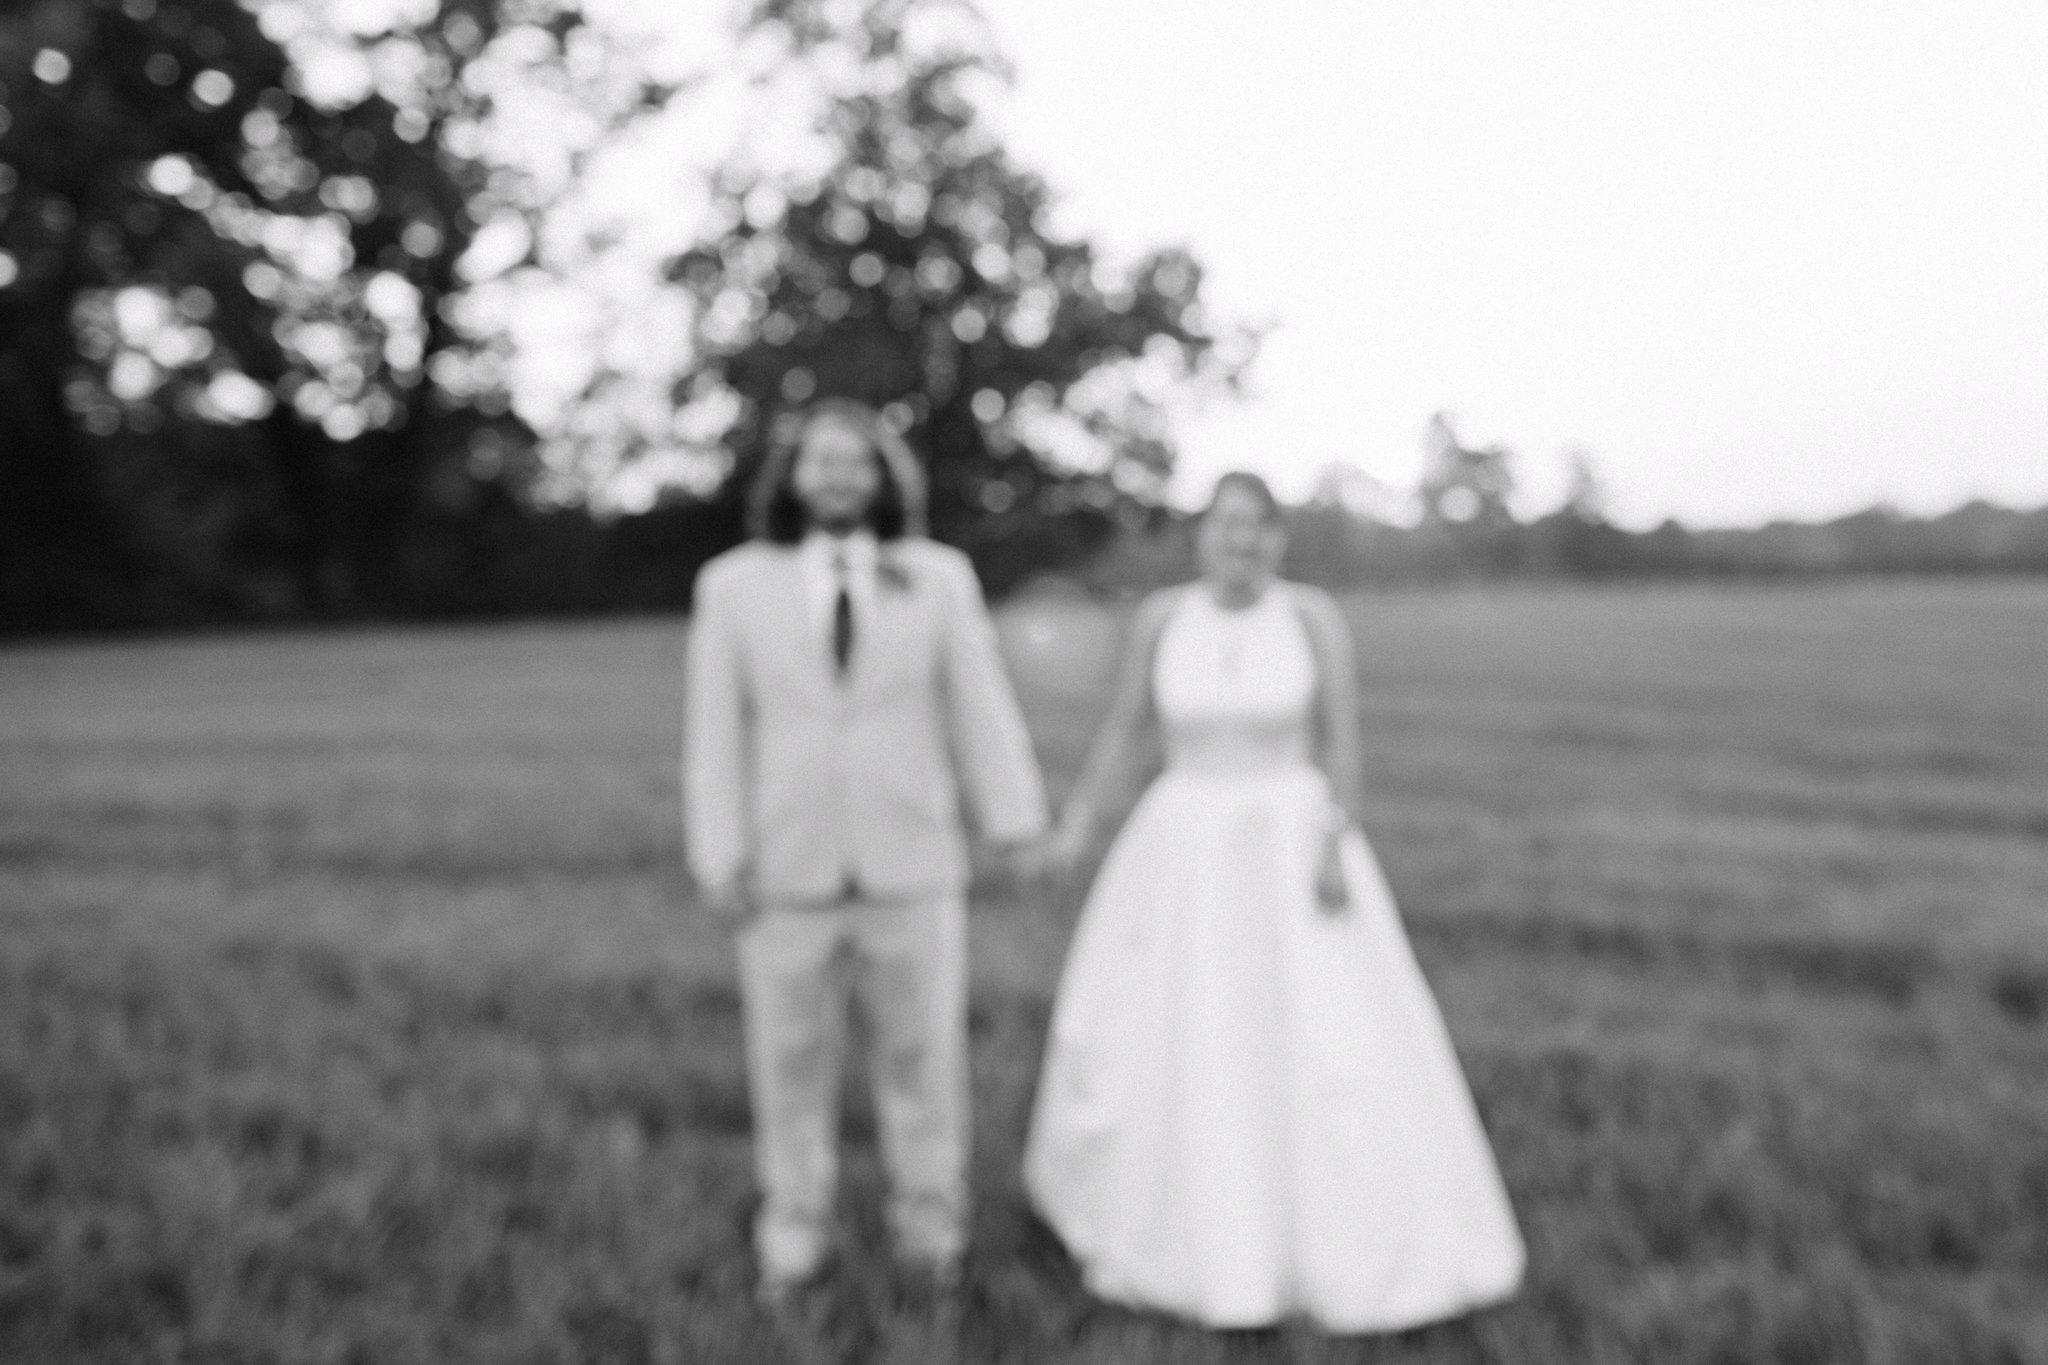 Lindsay&JoshMarried2017-08-31at19.08.12PM.jpg